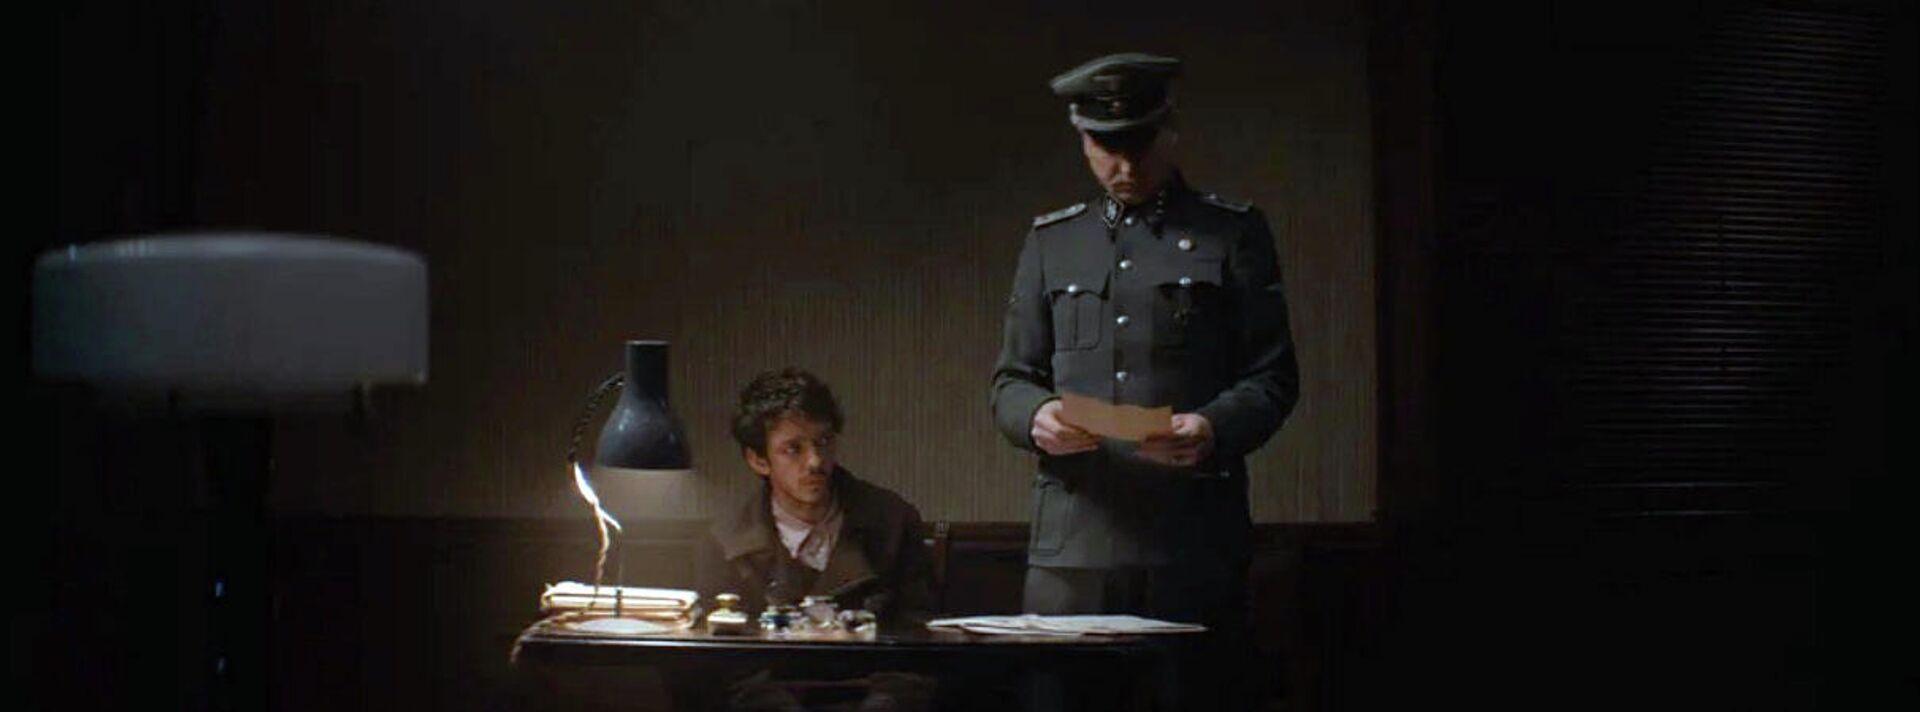 Кадр из фильма Уроки фарси - РИА Новости, 1920, 07.04.2021